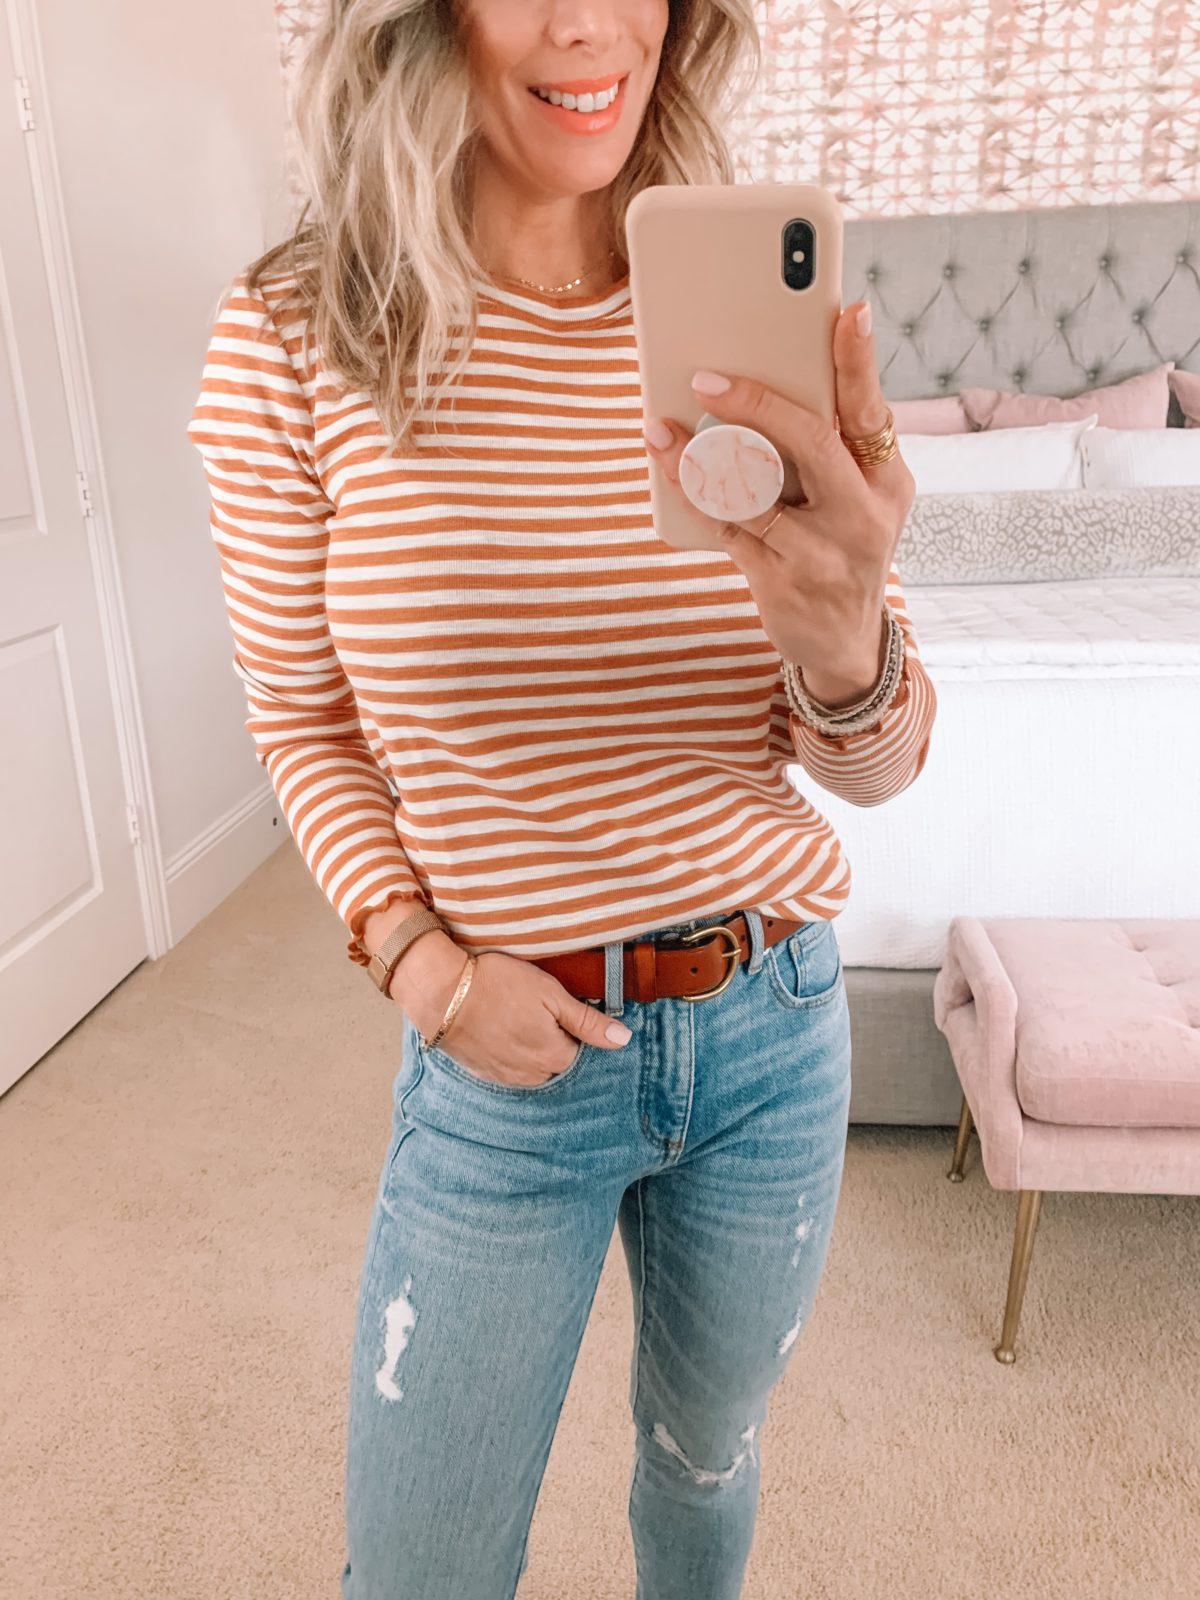 Dressing Room Finds, Stripe Tee, Jeans